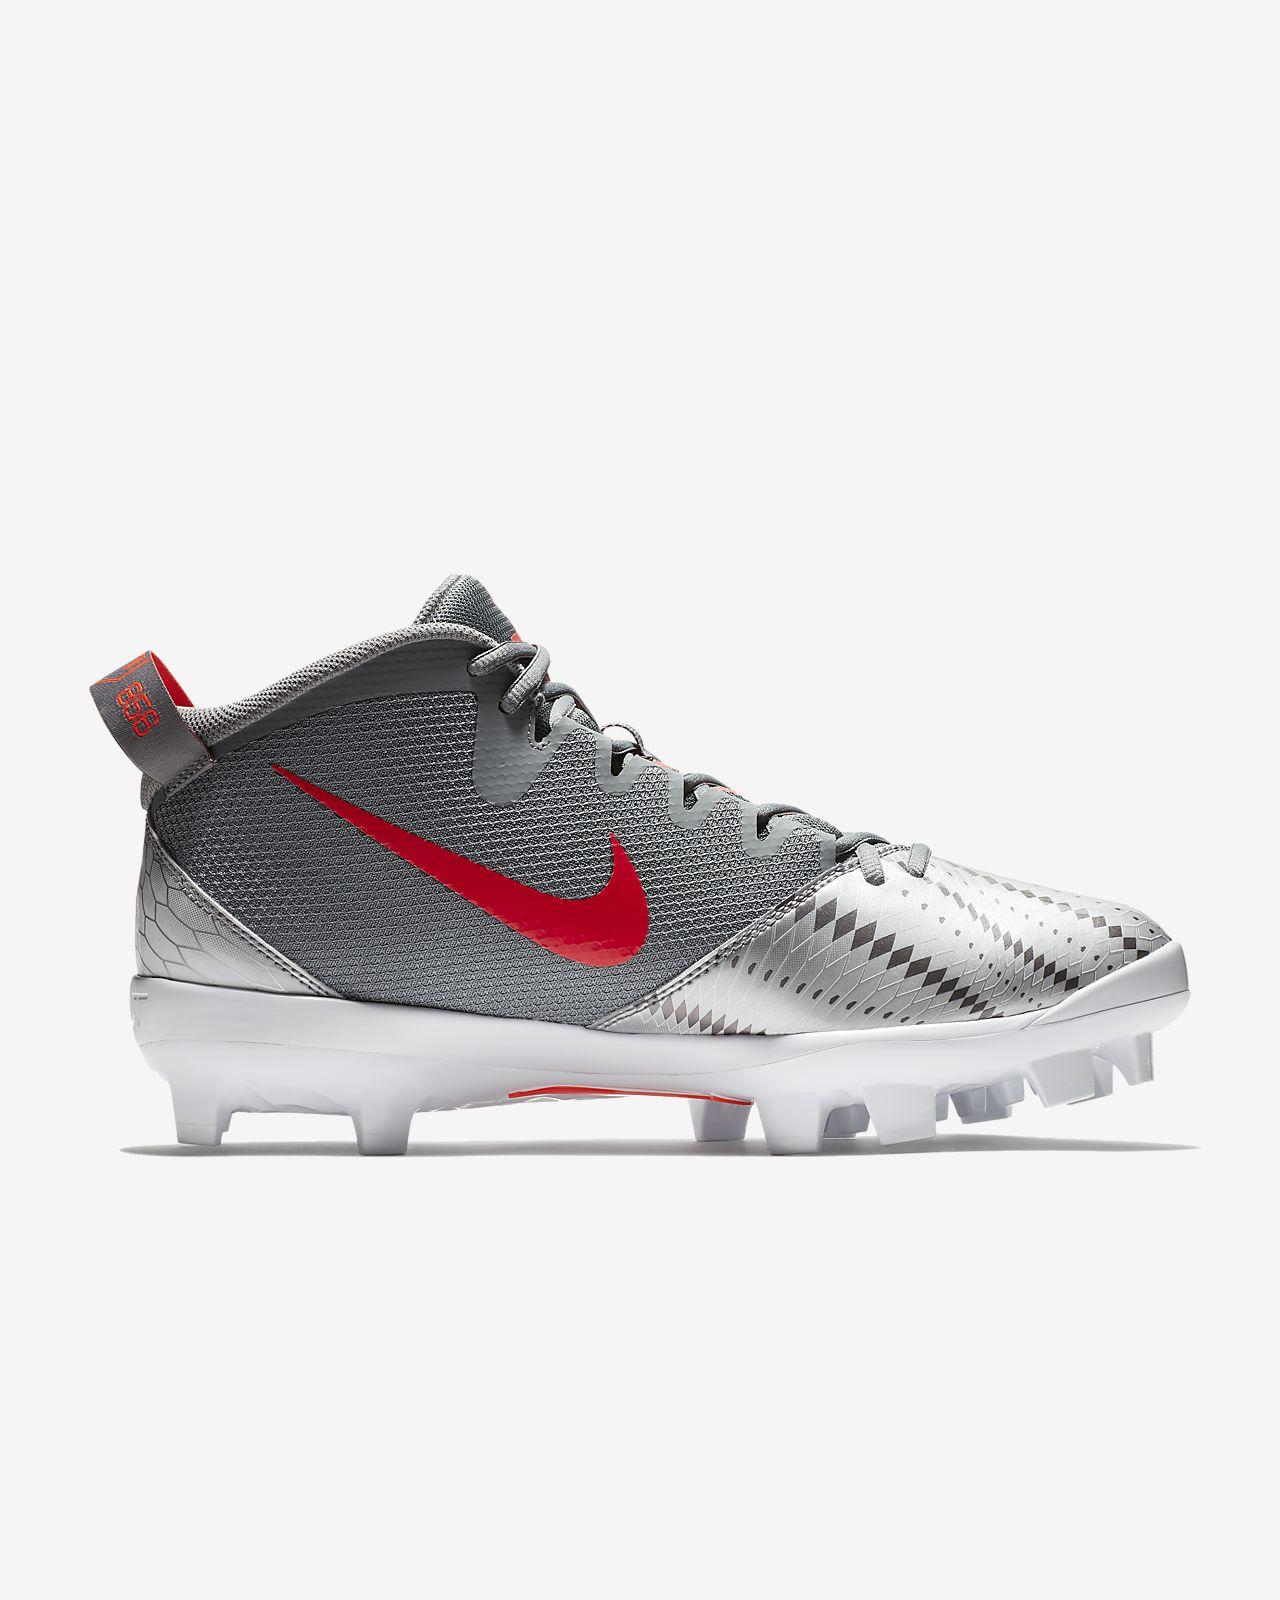 best website 36aac 90f6f ... Nike Force Zoom Trout 5 Pro MCS Men s Baseball Cleat